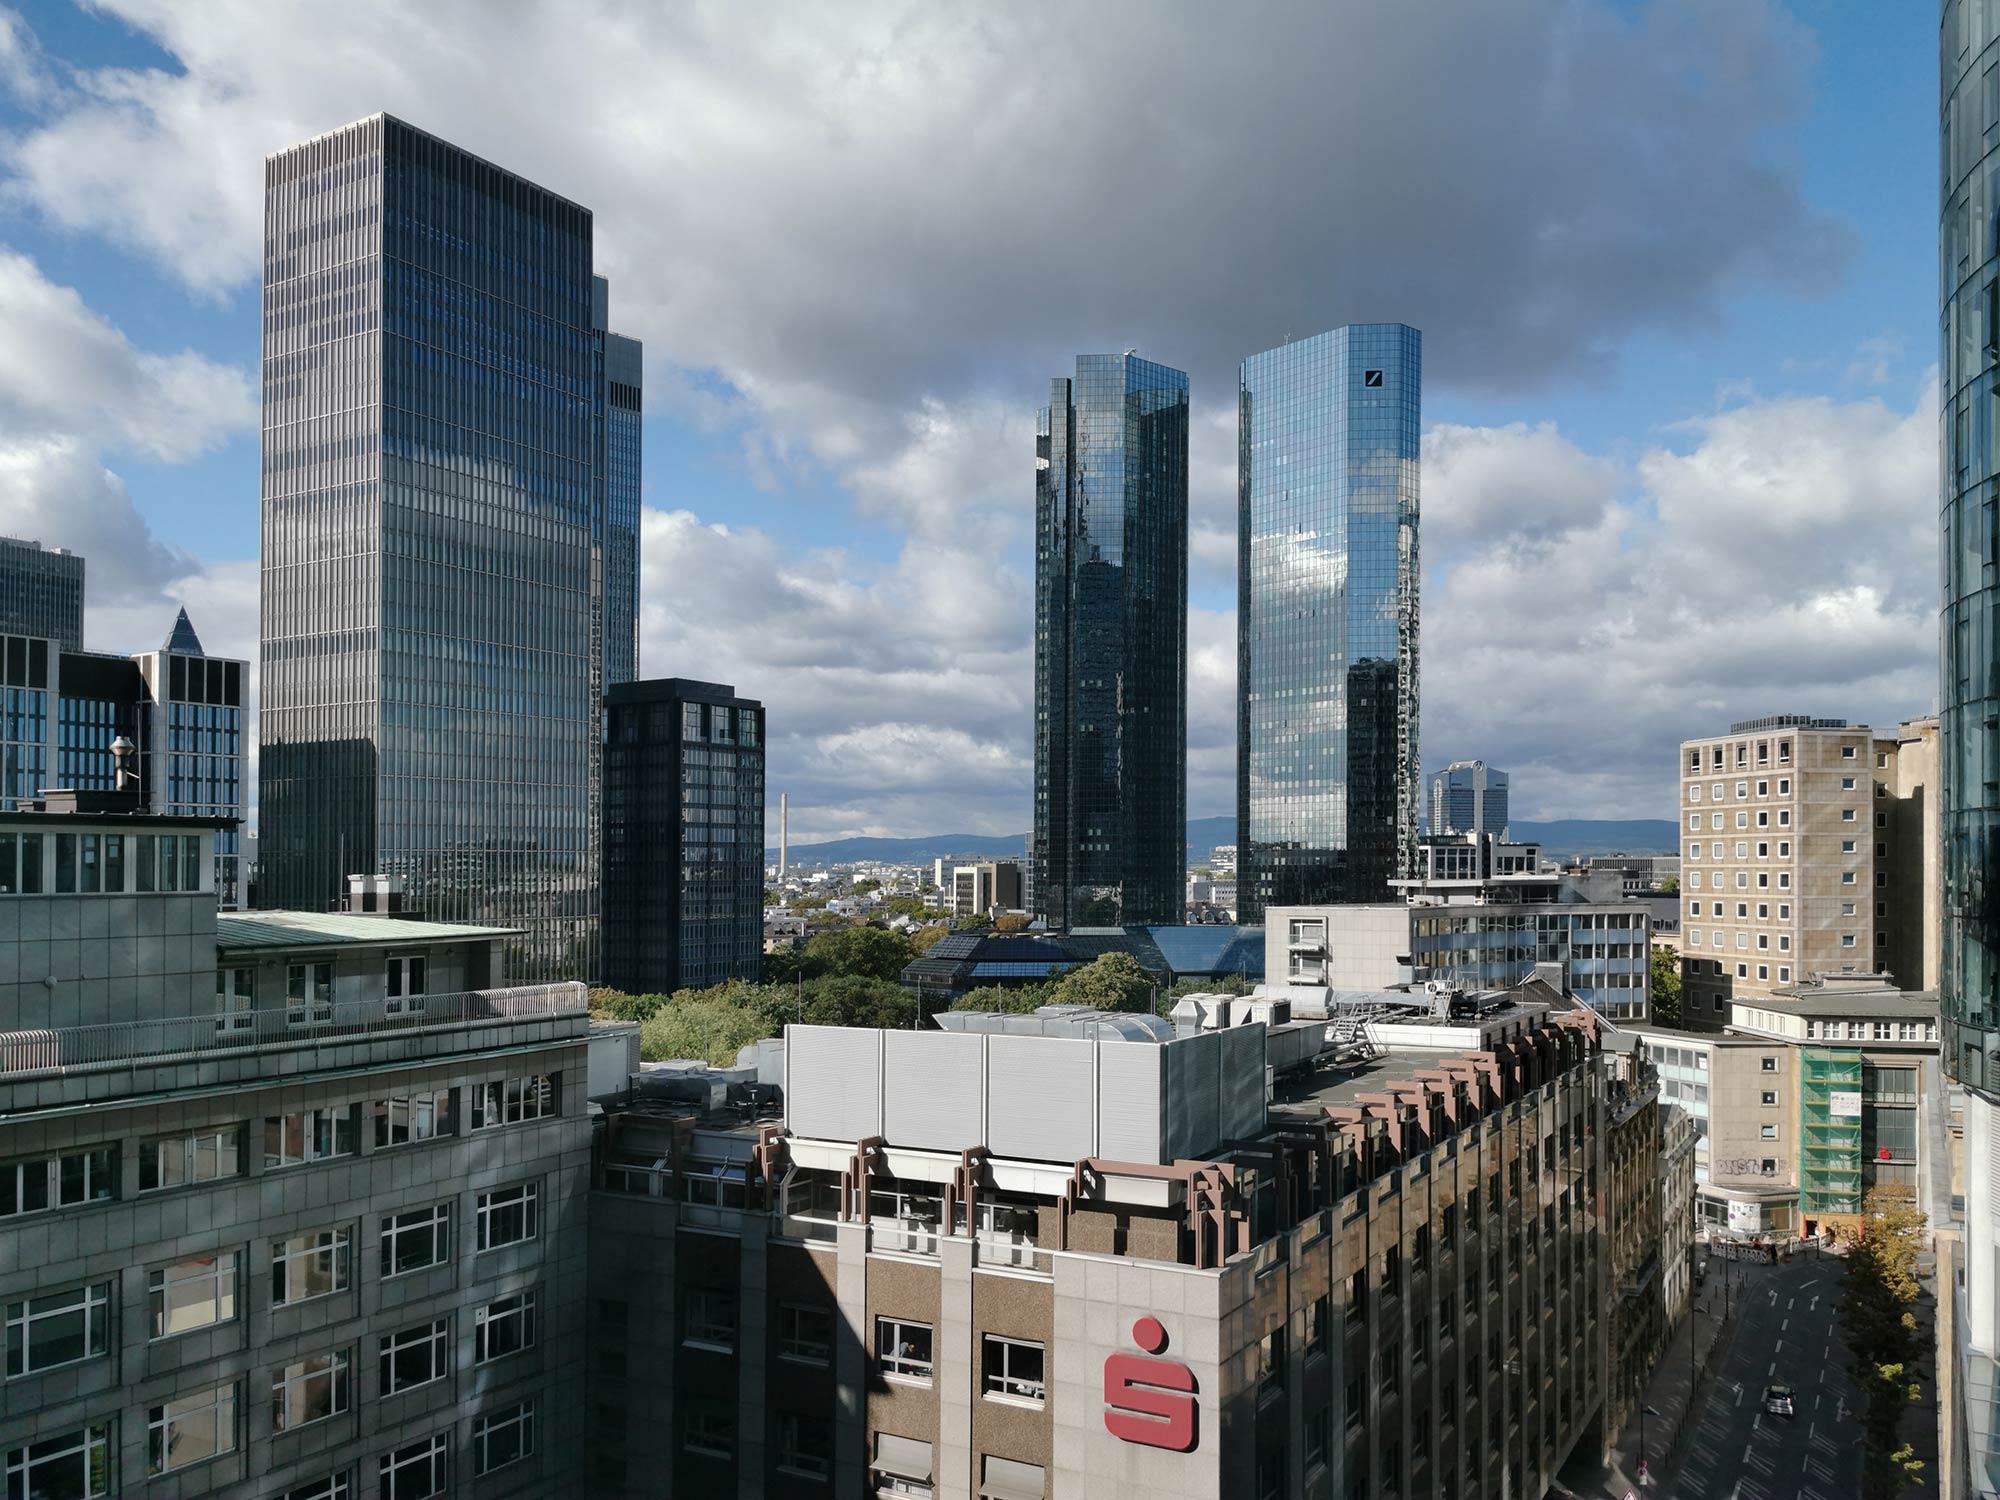 Deutsche Bank Zentrale Frankfurt am Main - Zwillingstürme Deutsche Bank AG - DB Hauptsitz